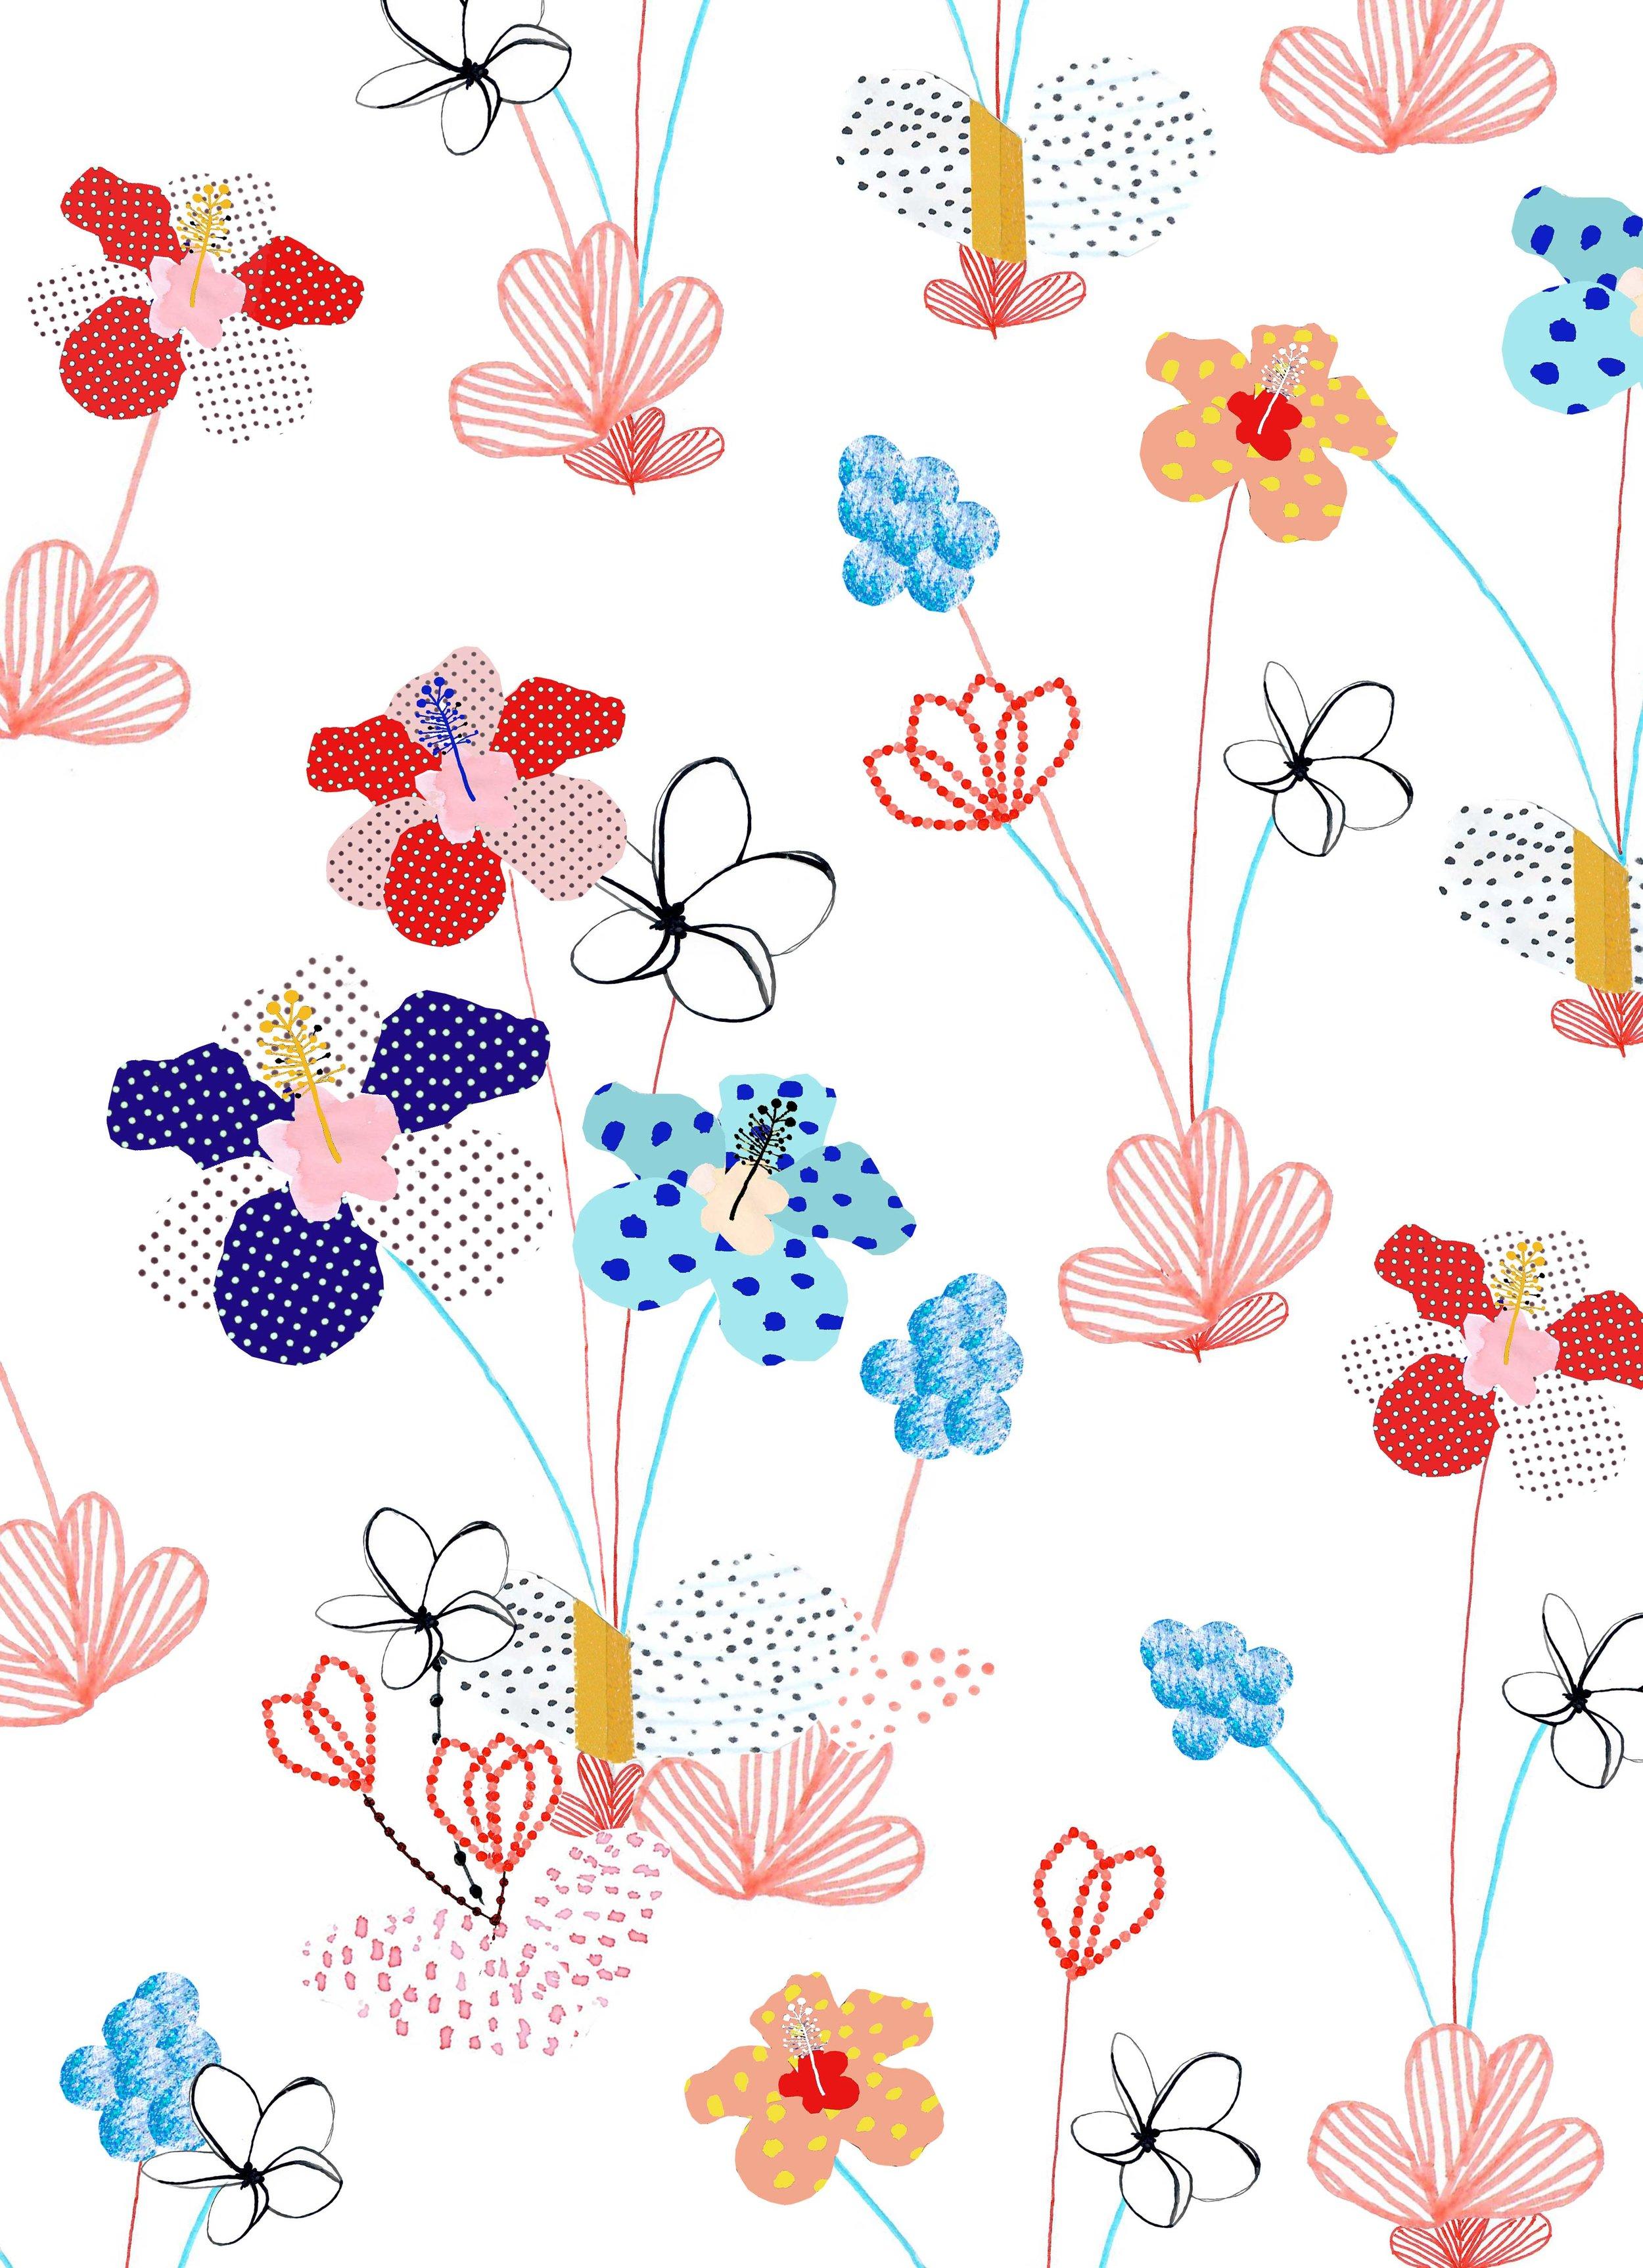 Mj_Floraldefweb.jpg